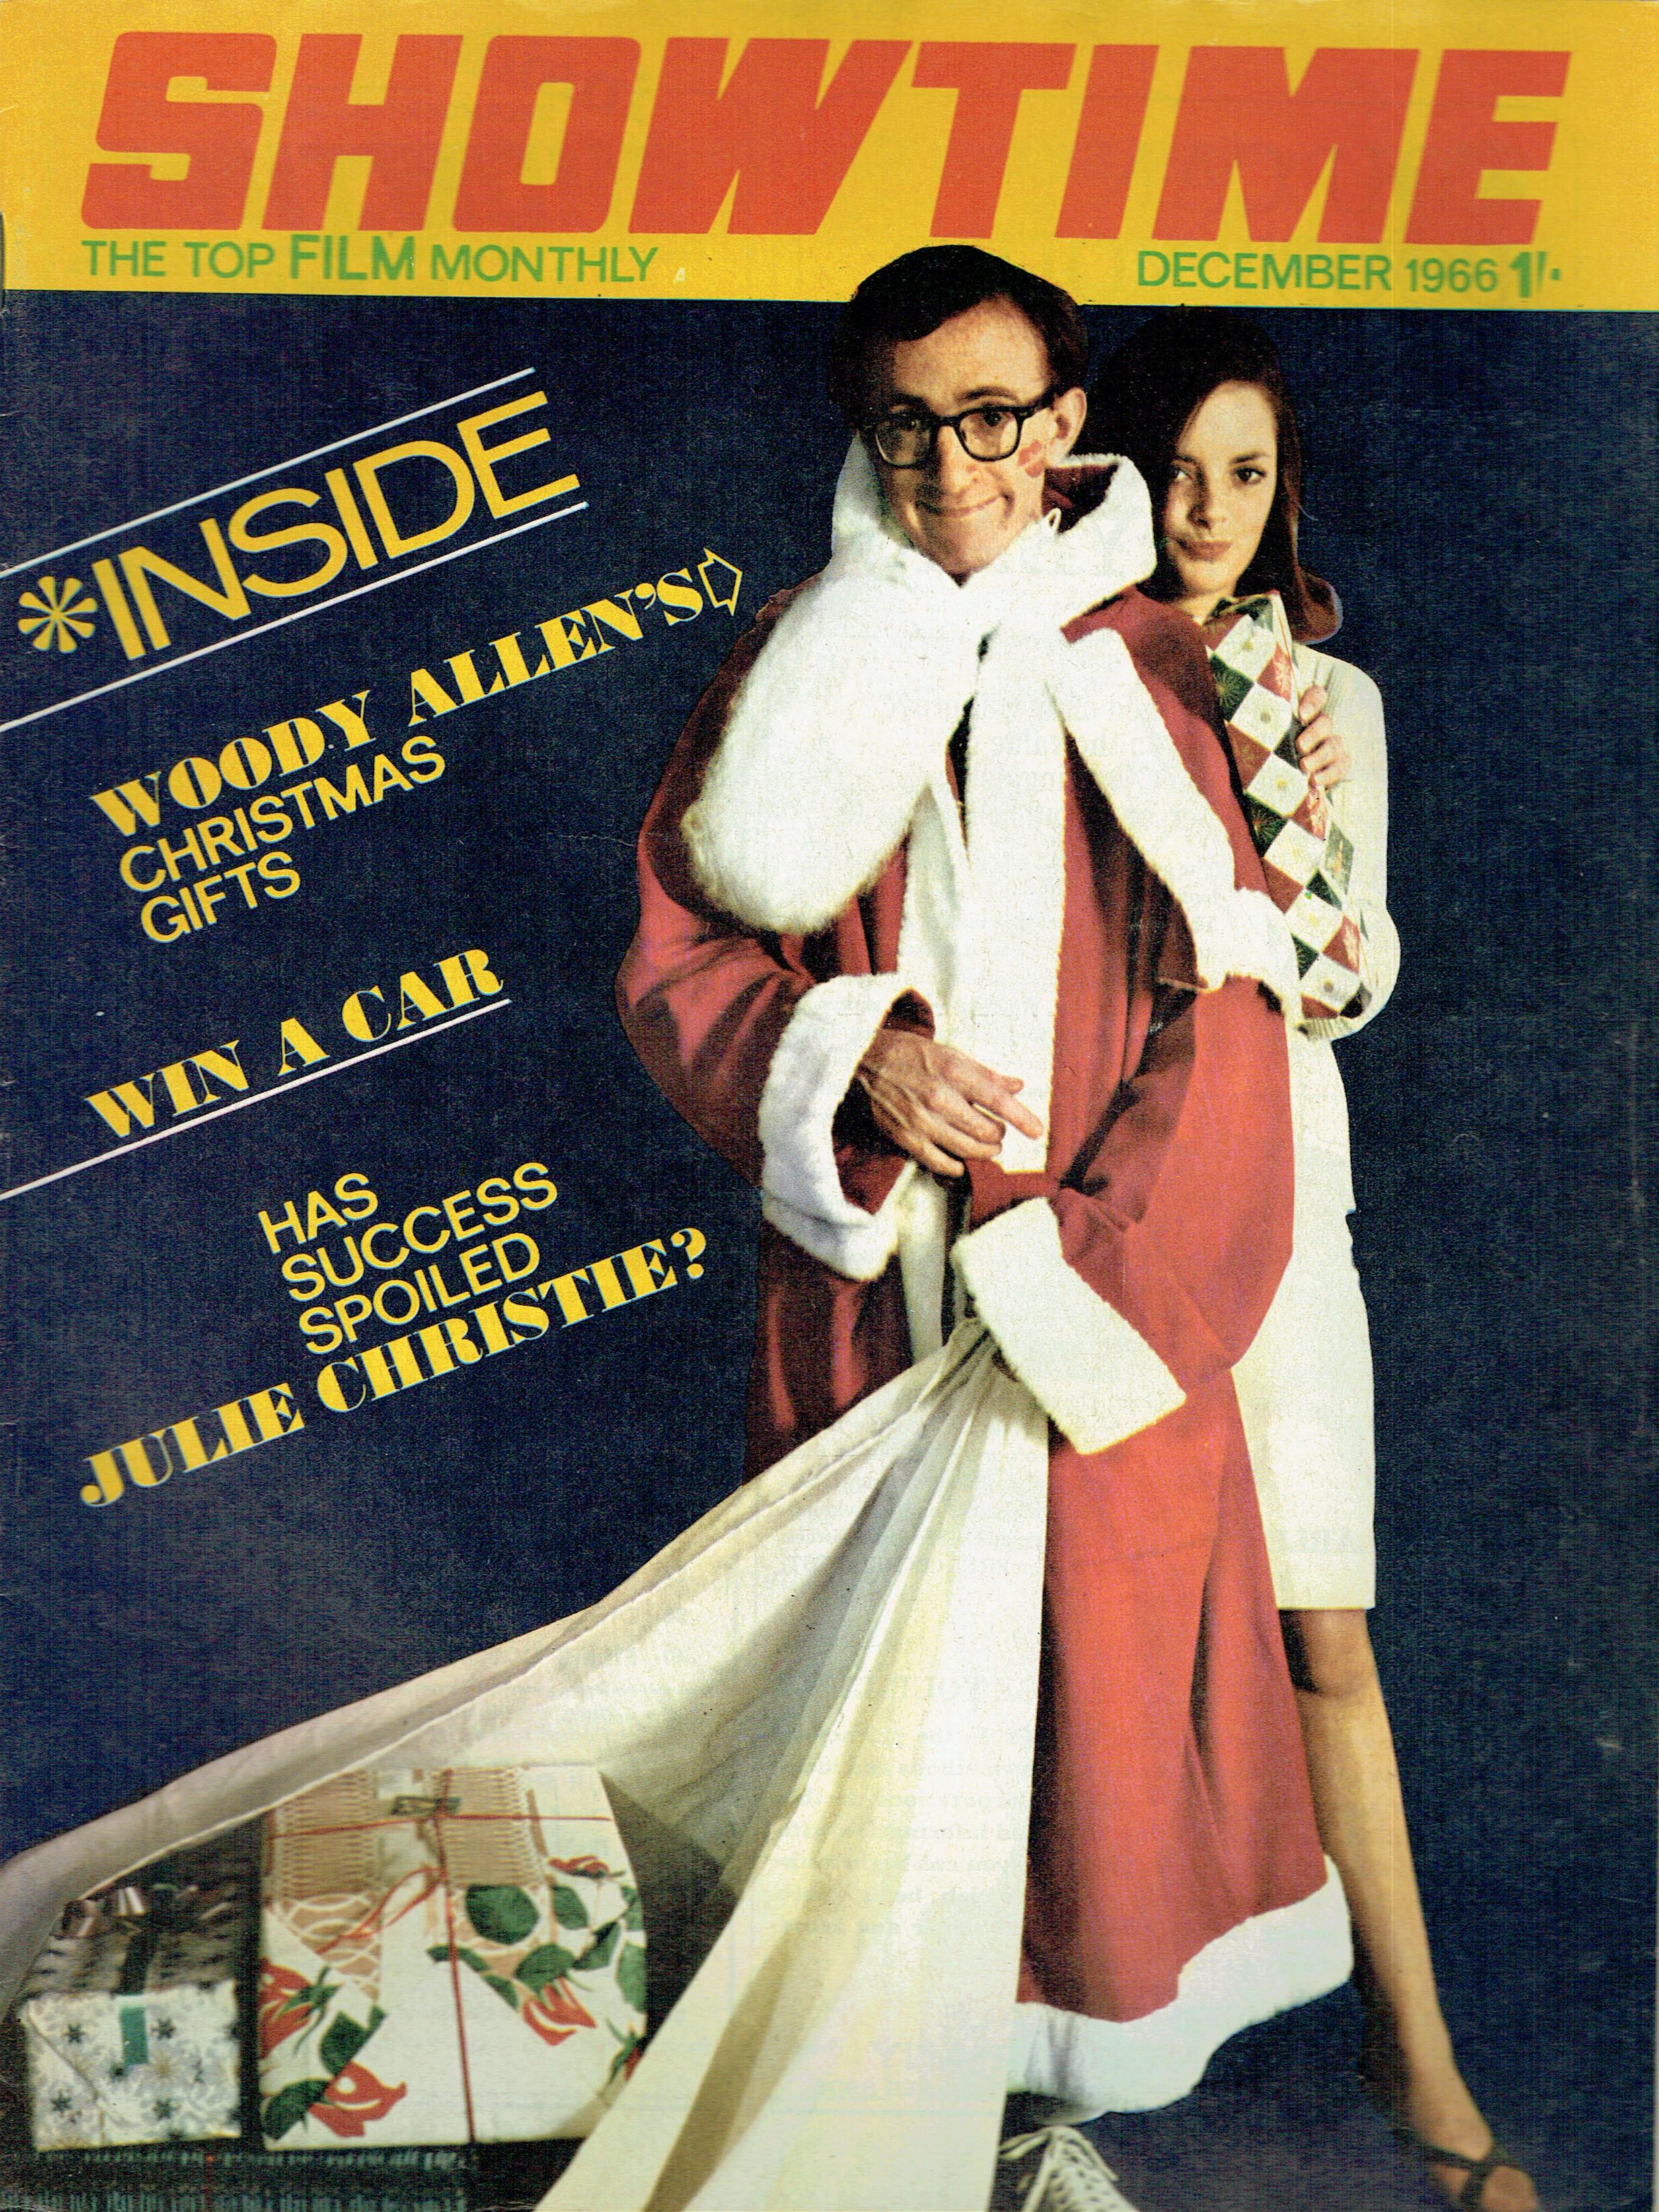 SHOWTIME UK FILM MAGAZINE DECEMBER 1966 ...